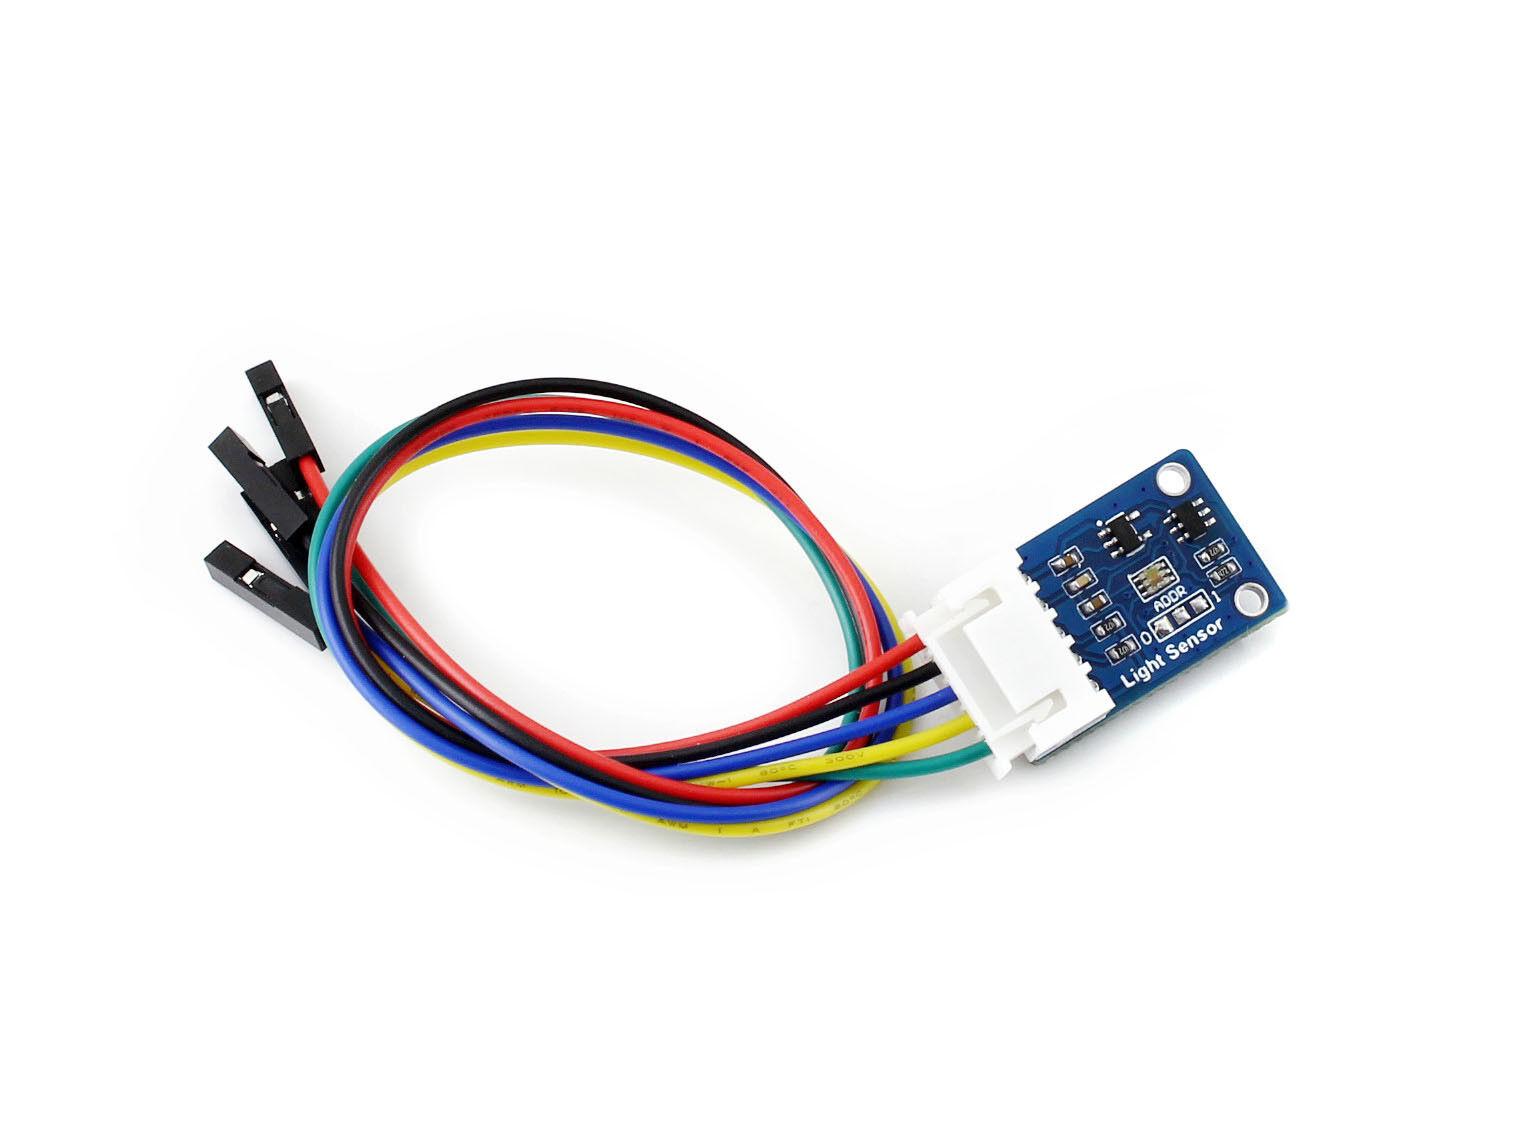 Ambient Light Sensor >> Light Sensor Module Tsl2581fn 16 Bit I2c Ambient Light Intensity Detection Kit